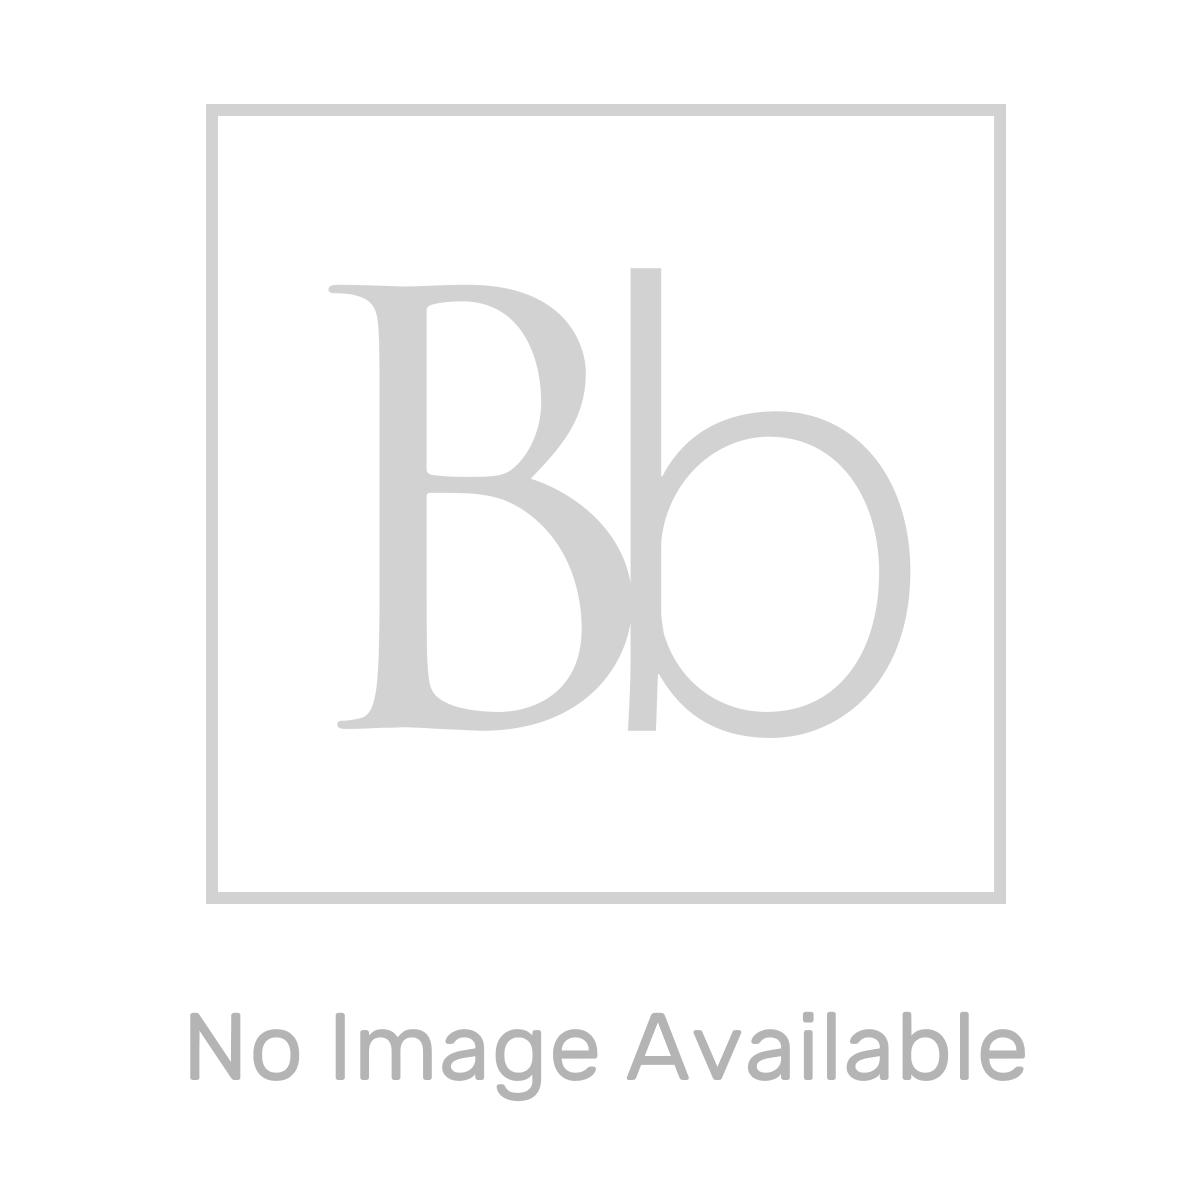 BTL Morina Elm Grey Floor Vanity Unit with Basin 615mm